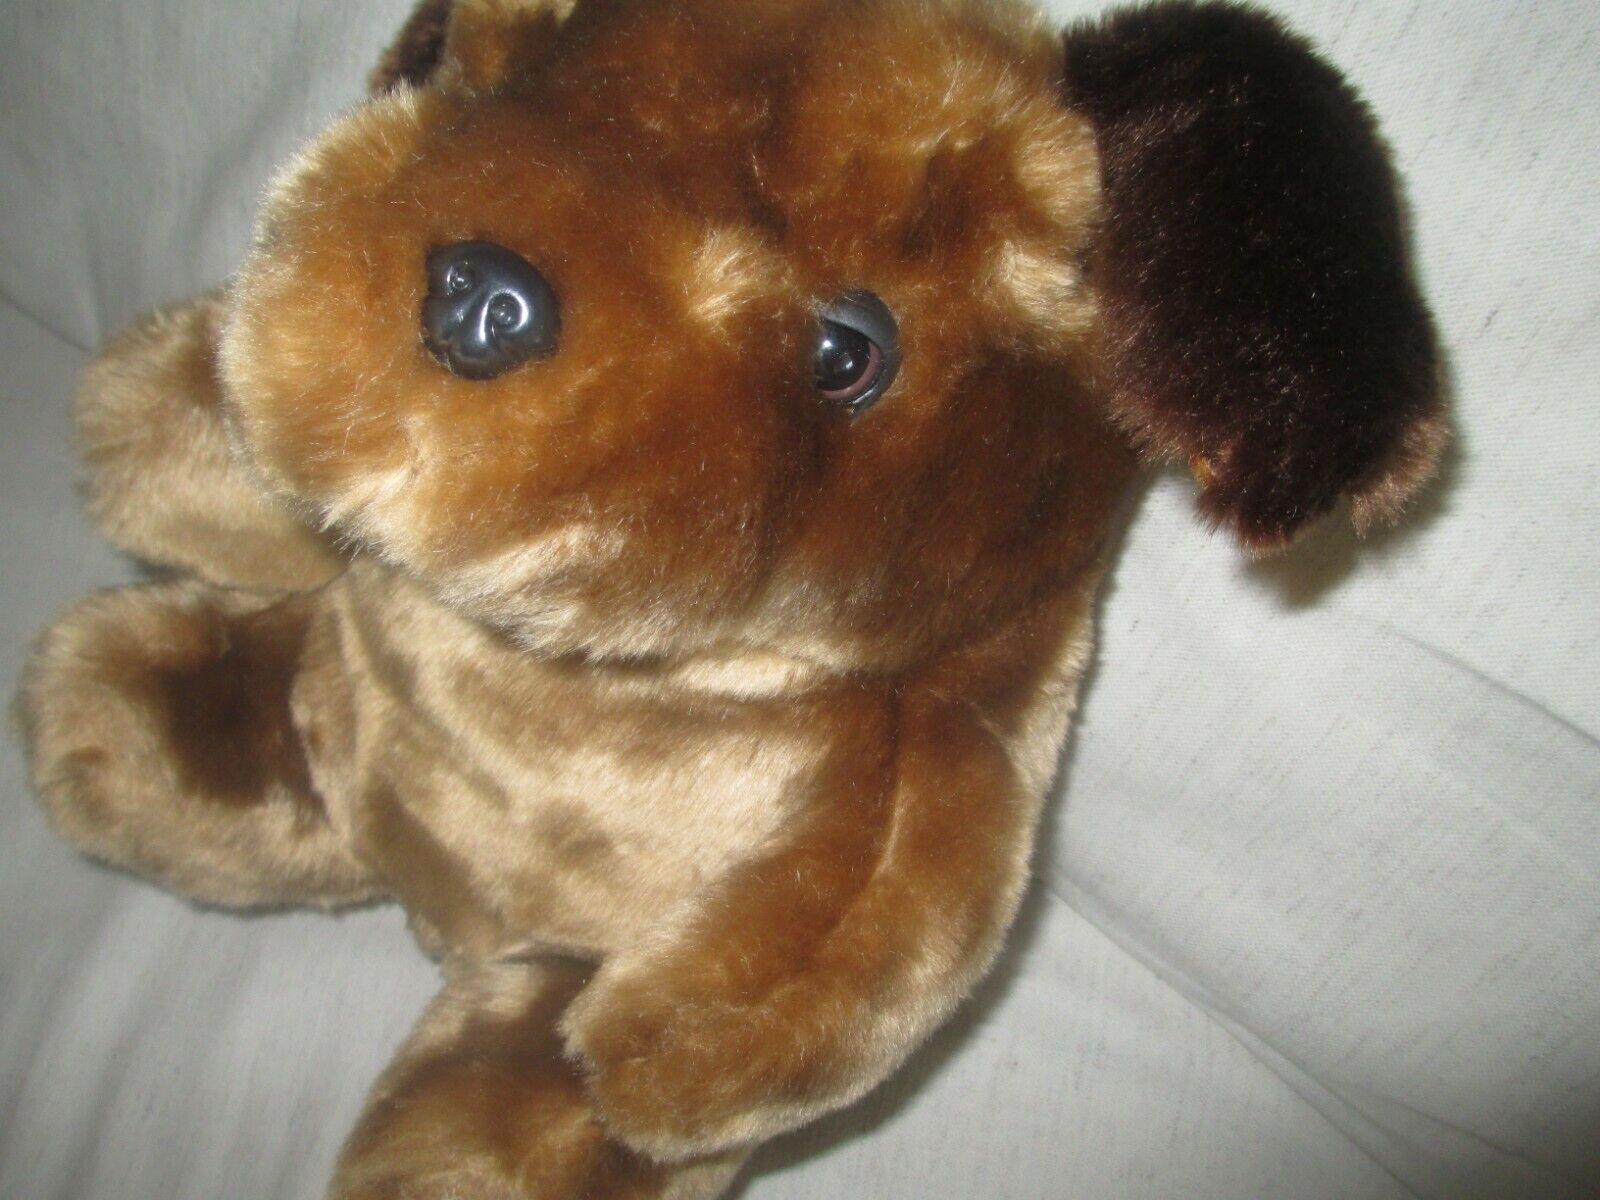 Brown Dog stuffed animal, 12 Inches Tall